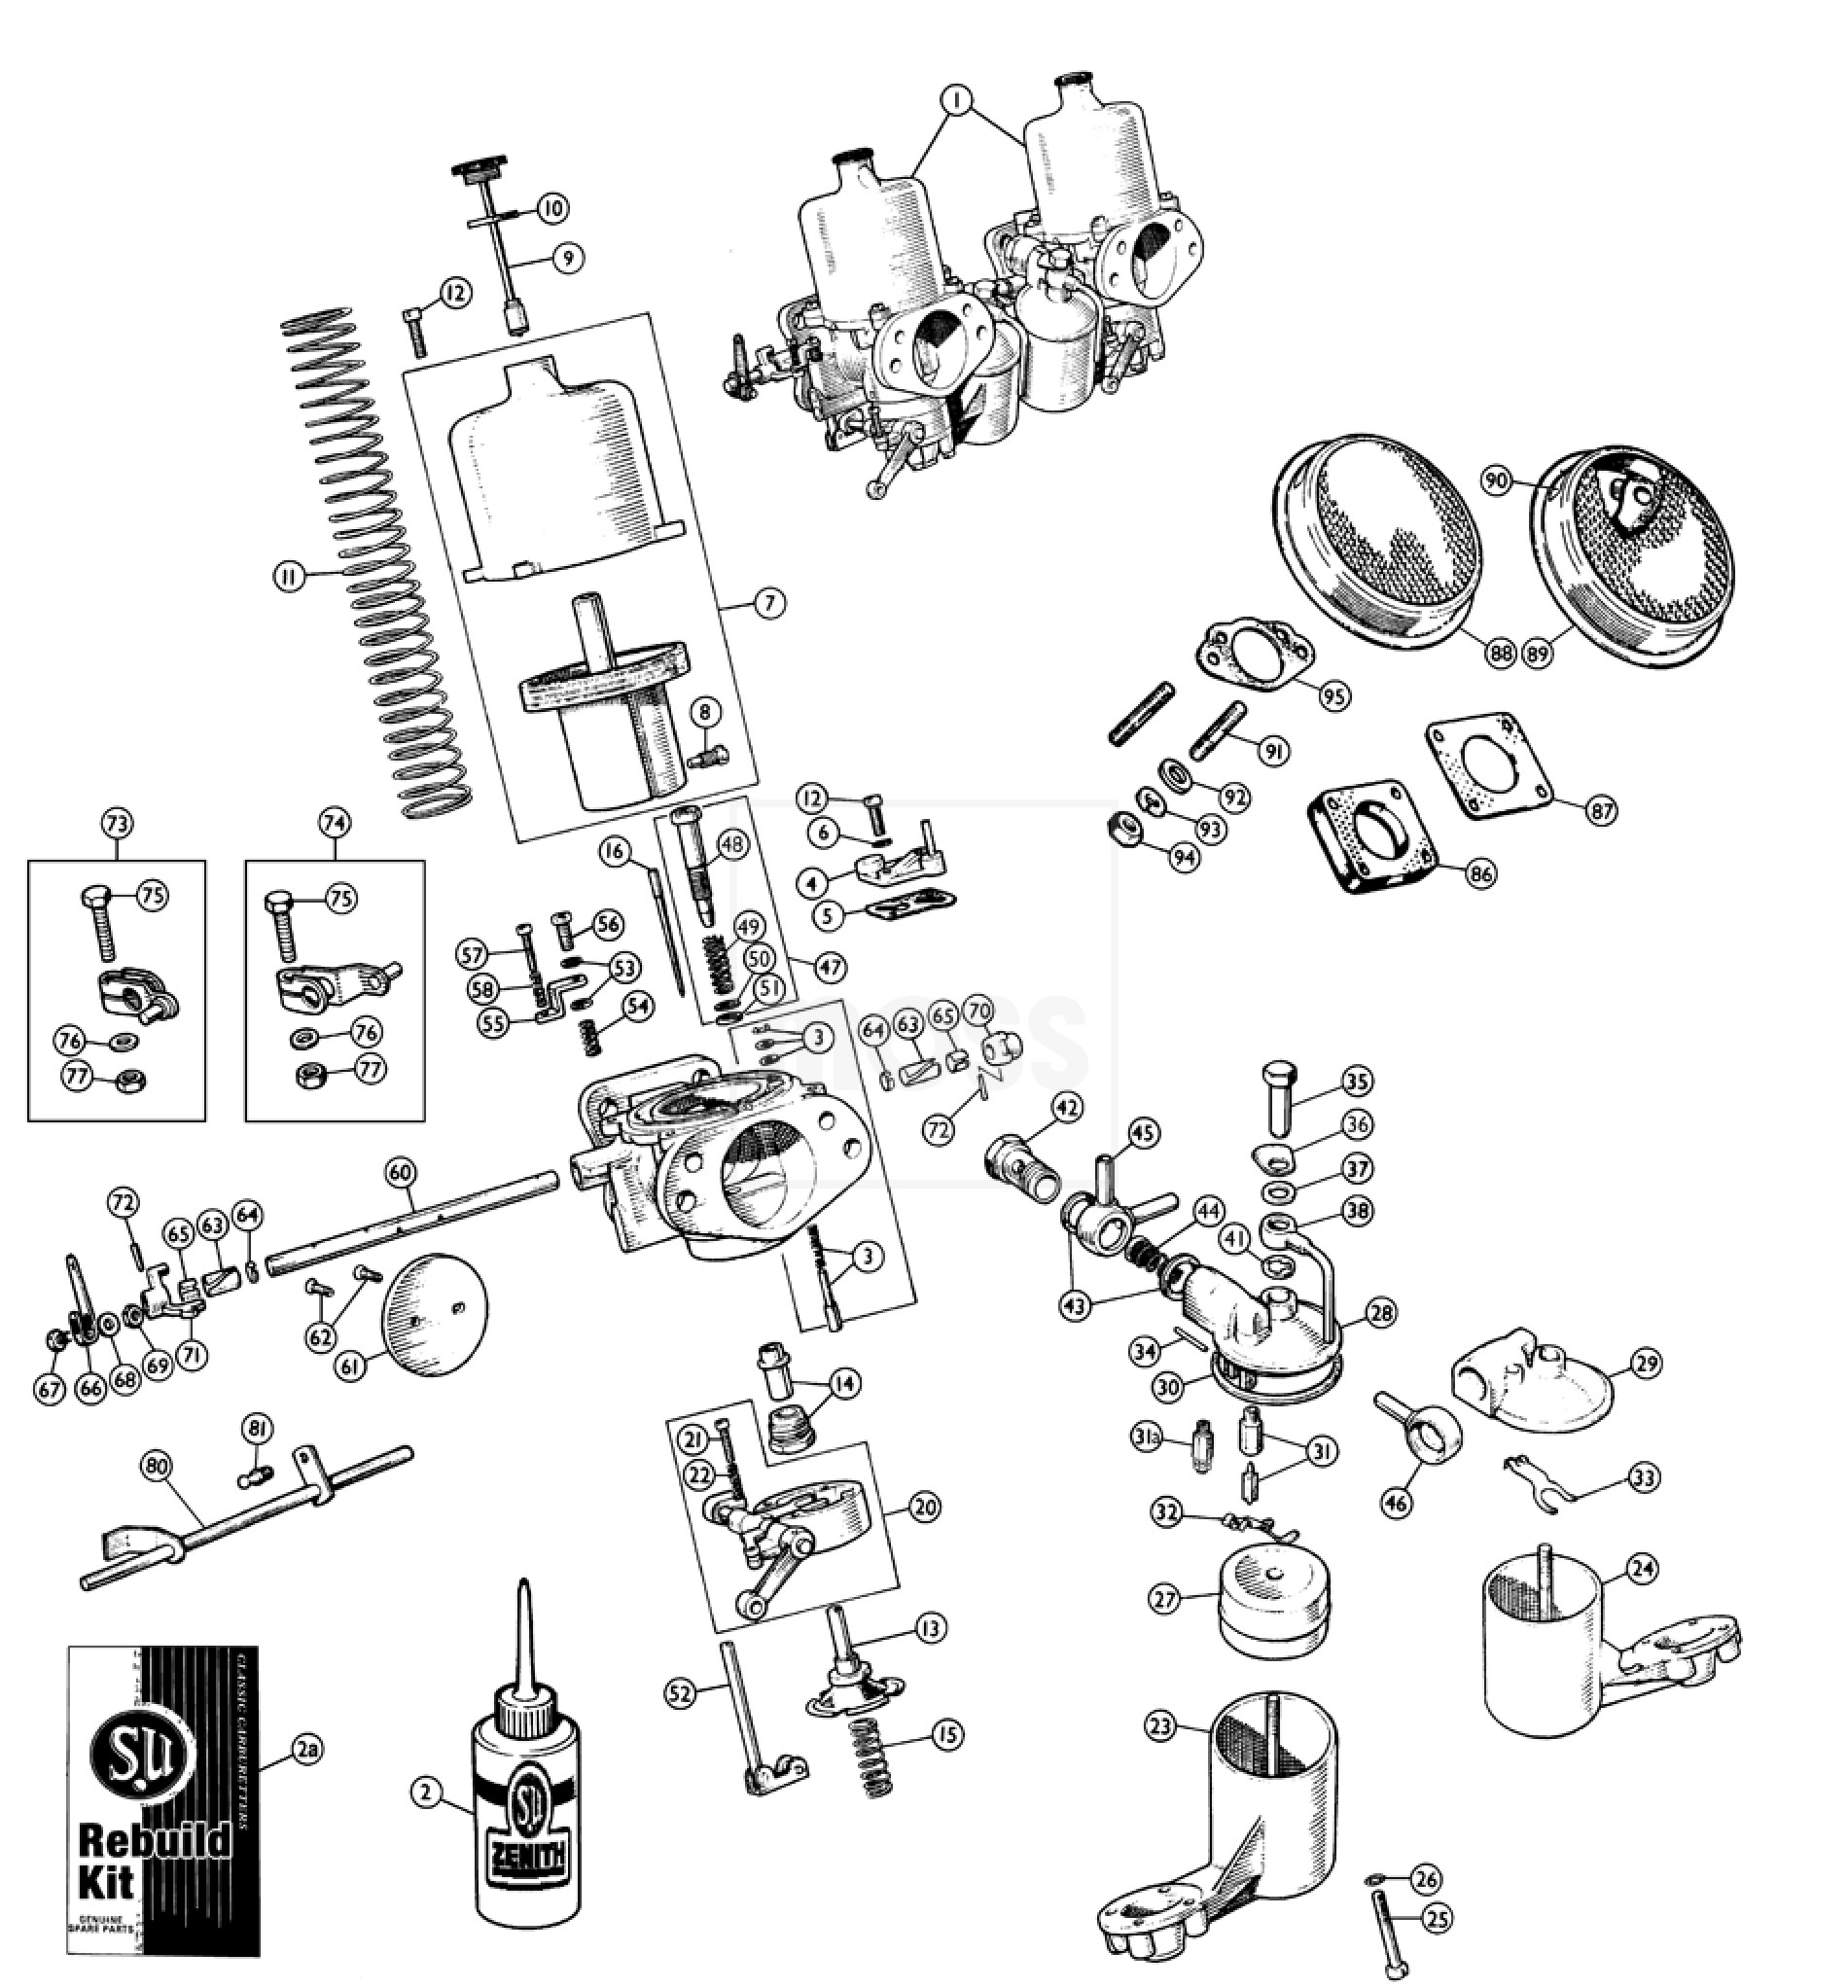 hd8 type carburettors  u0026 air filters